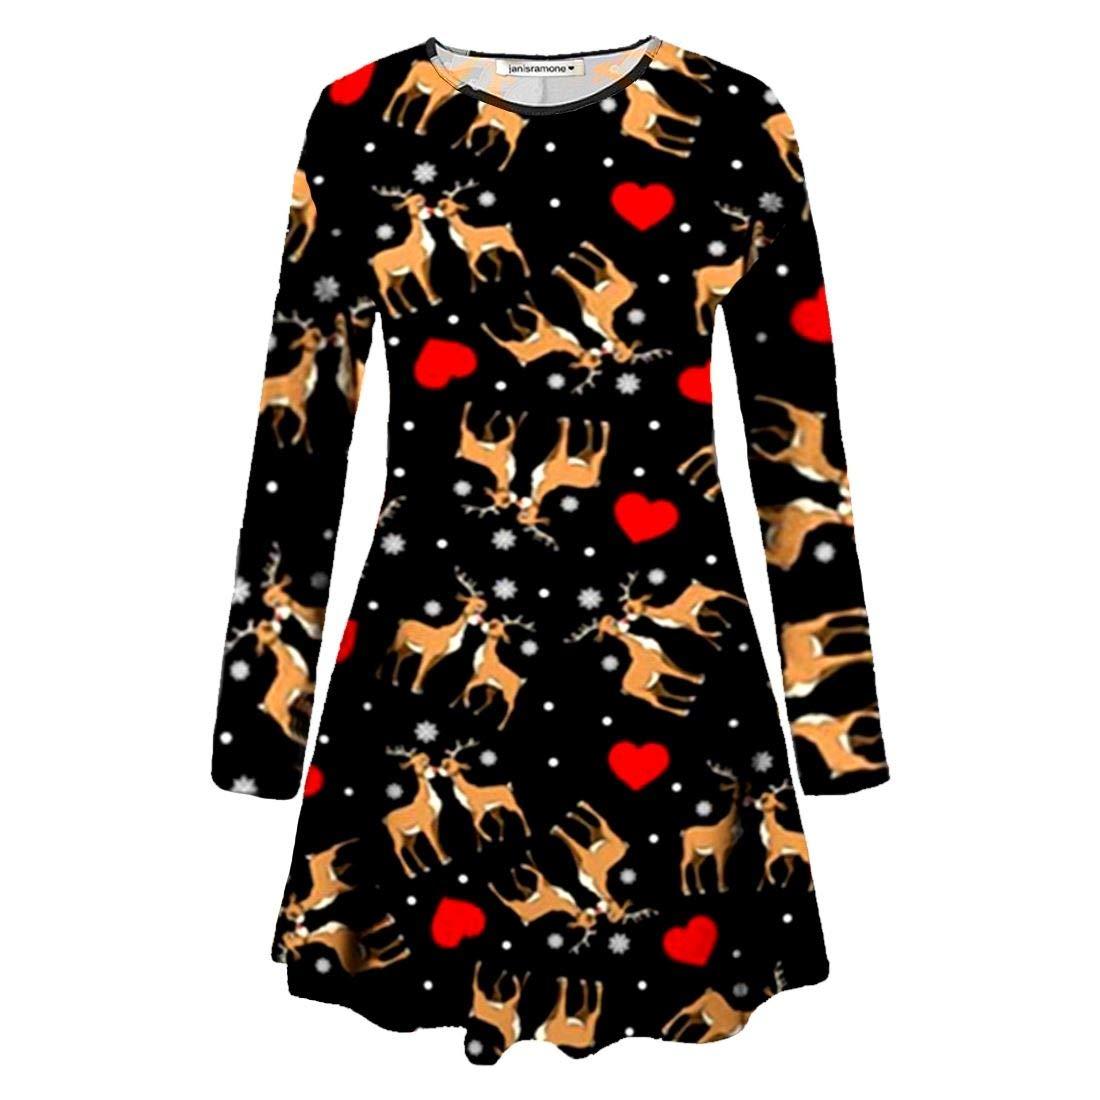 janisramone Girls Kids New Christmas Santa Snowman Elf Reindeer Print Flared Skater Xmas Mini Swing Dress Top